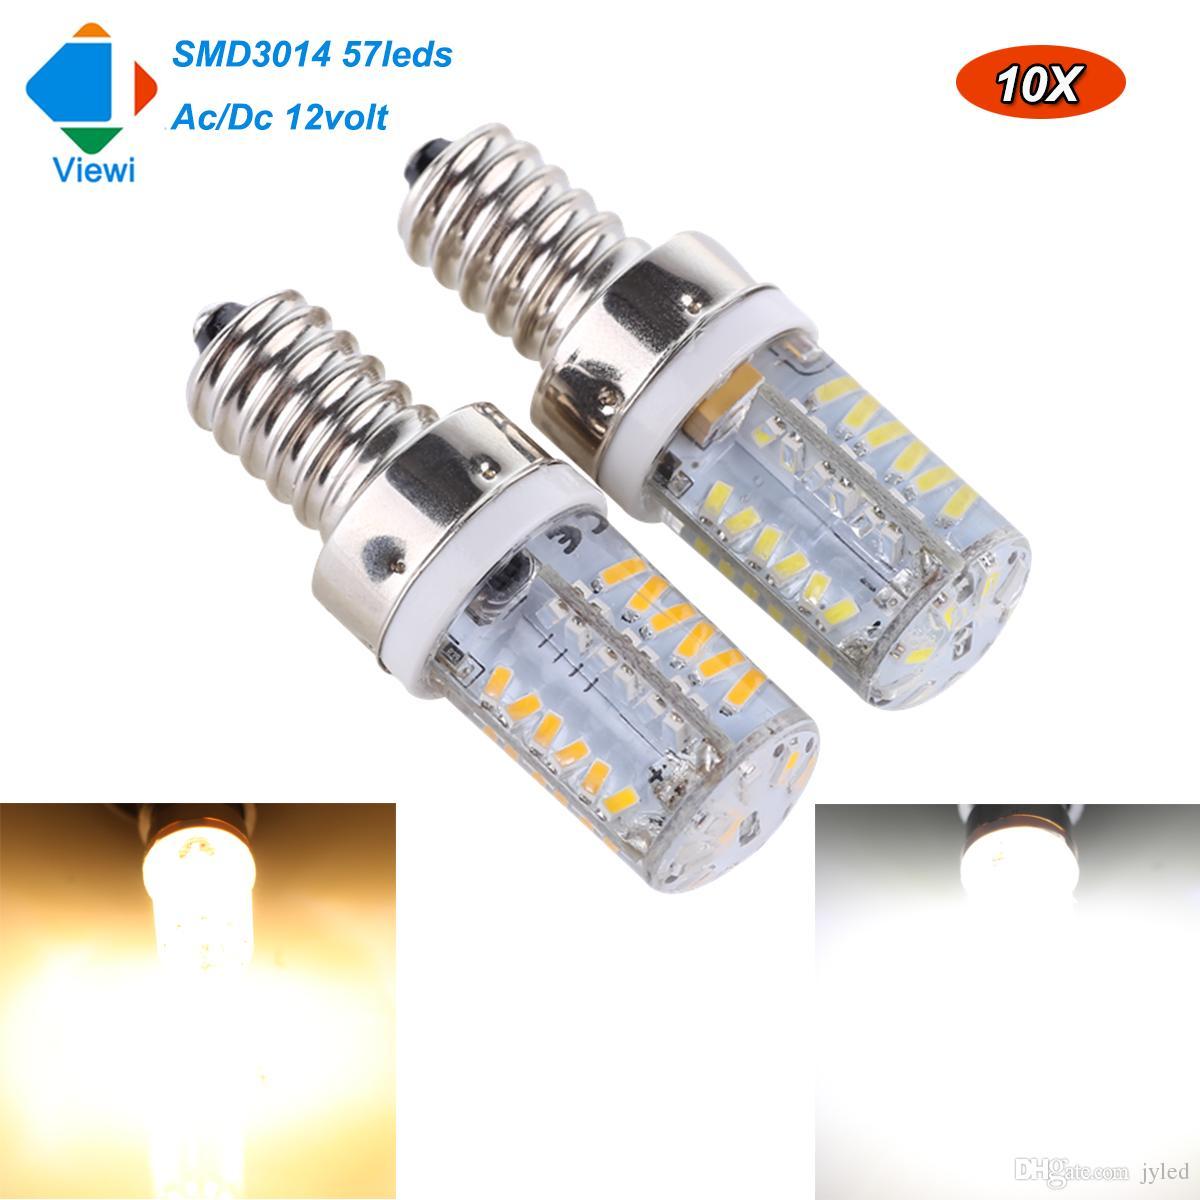 viewi 10x ampolletas 12 volt bulb light led energy saving lamp e12 12v smd 3014 57 leds 2w 220 lumens silicone bulbs lamps e12 led lamp 12 volt led bulb e12